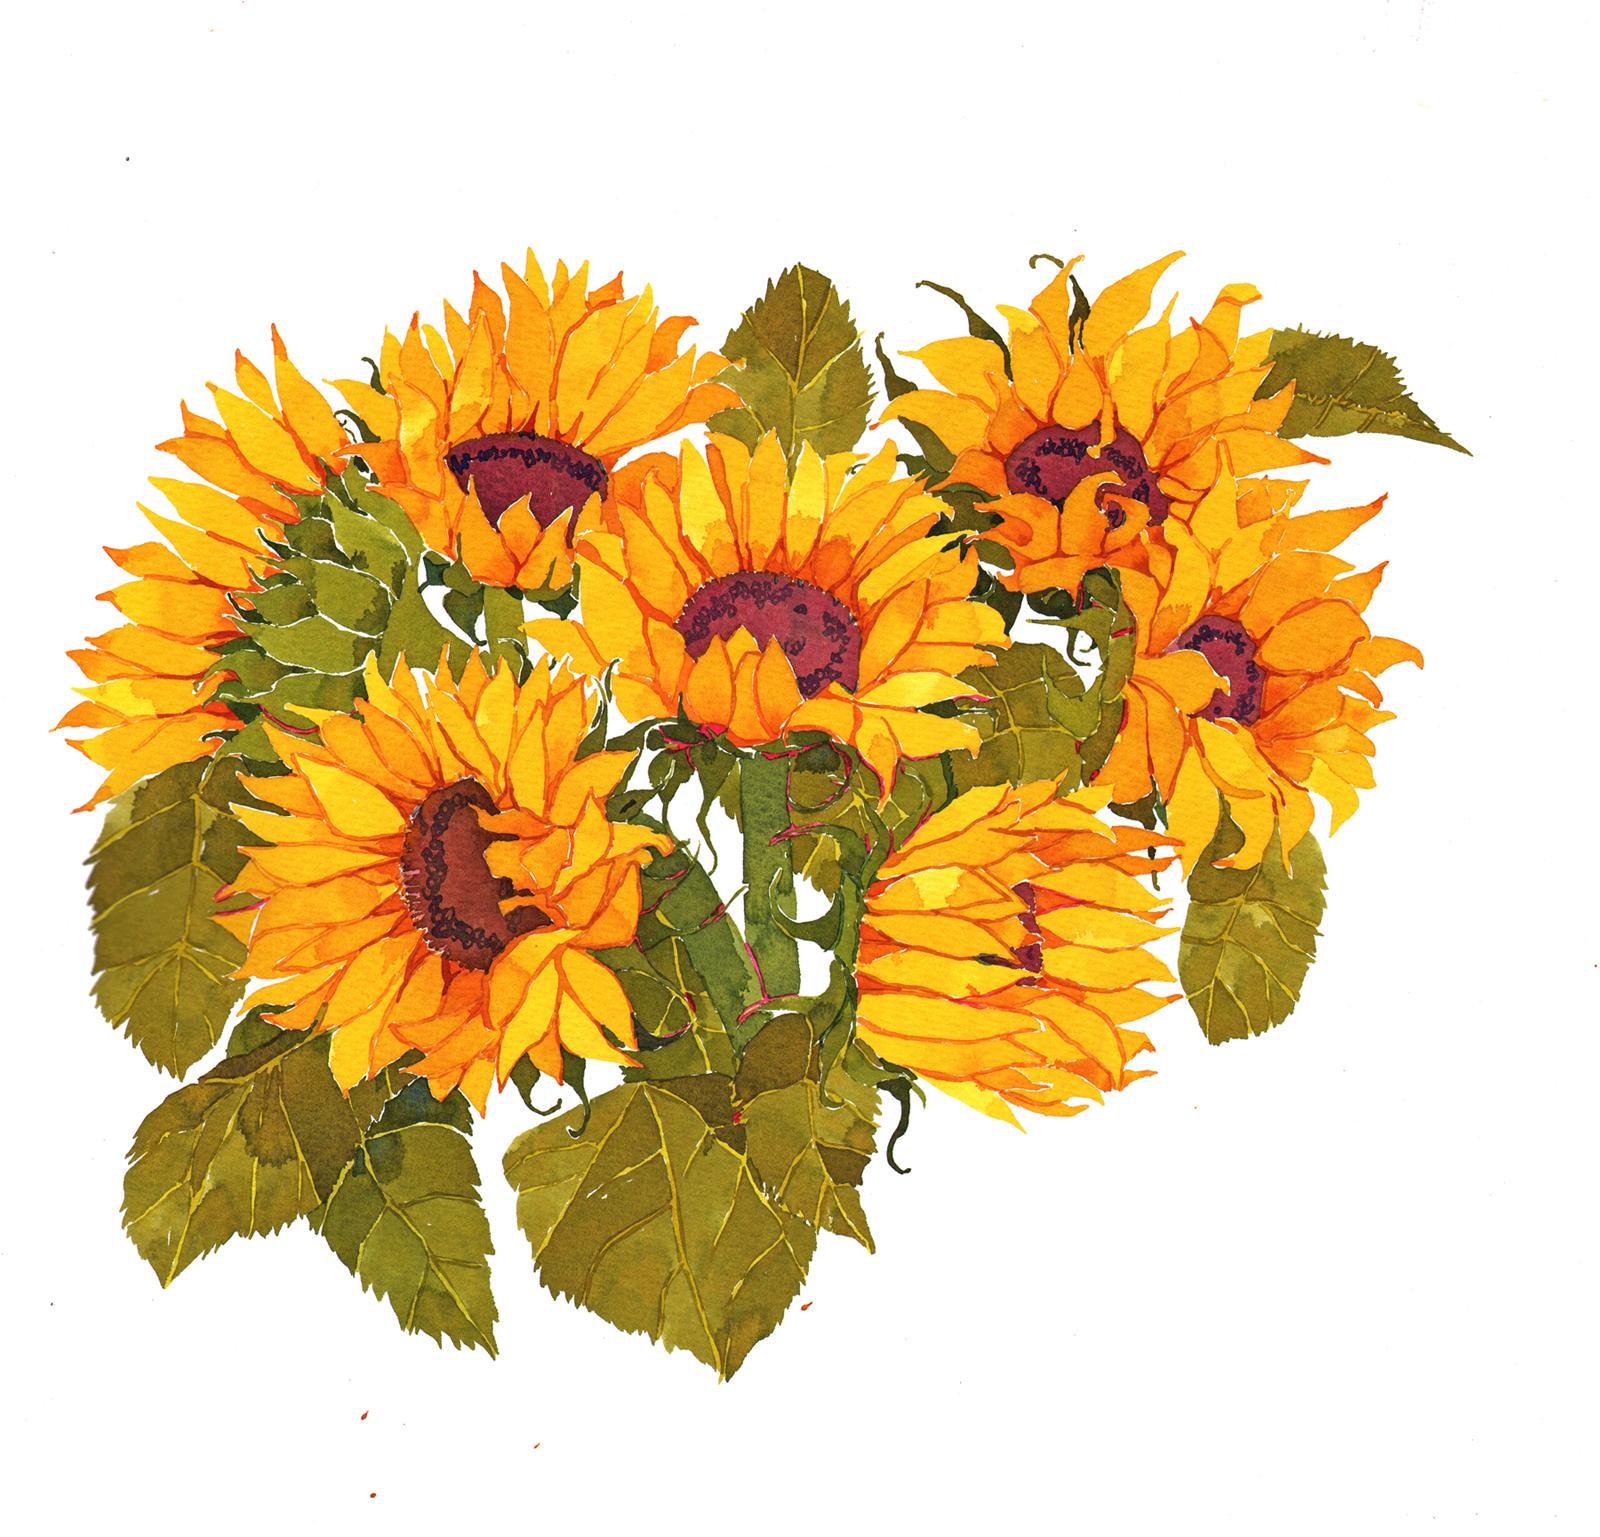 Sunflowers II SOLD image